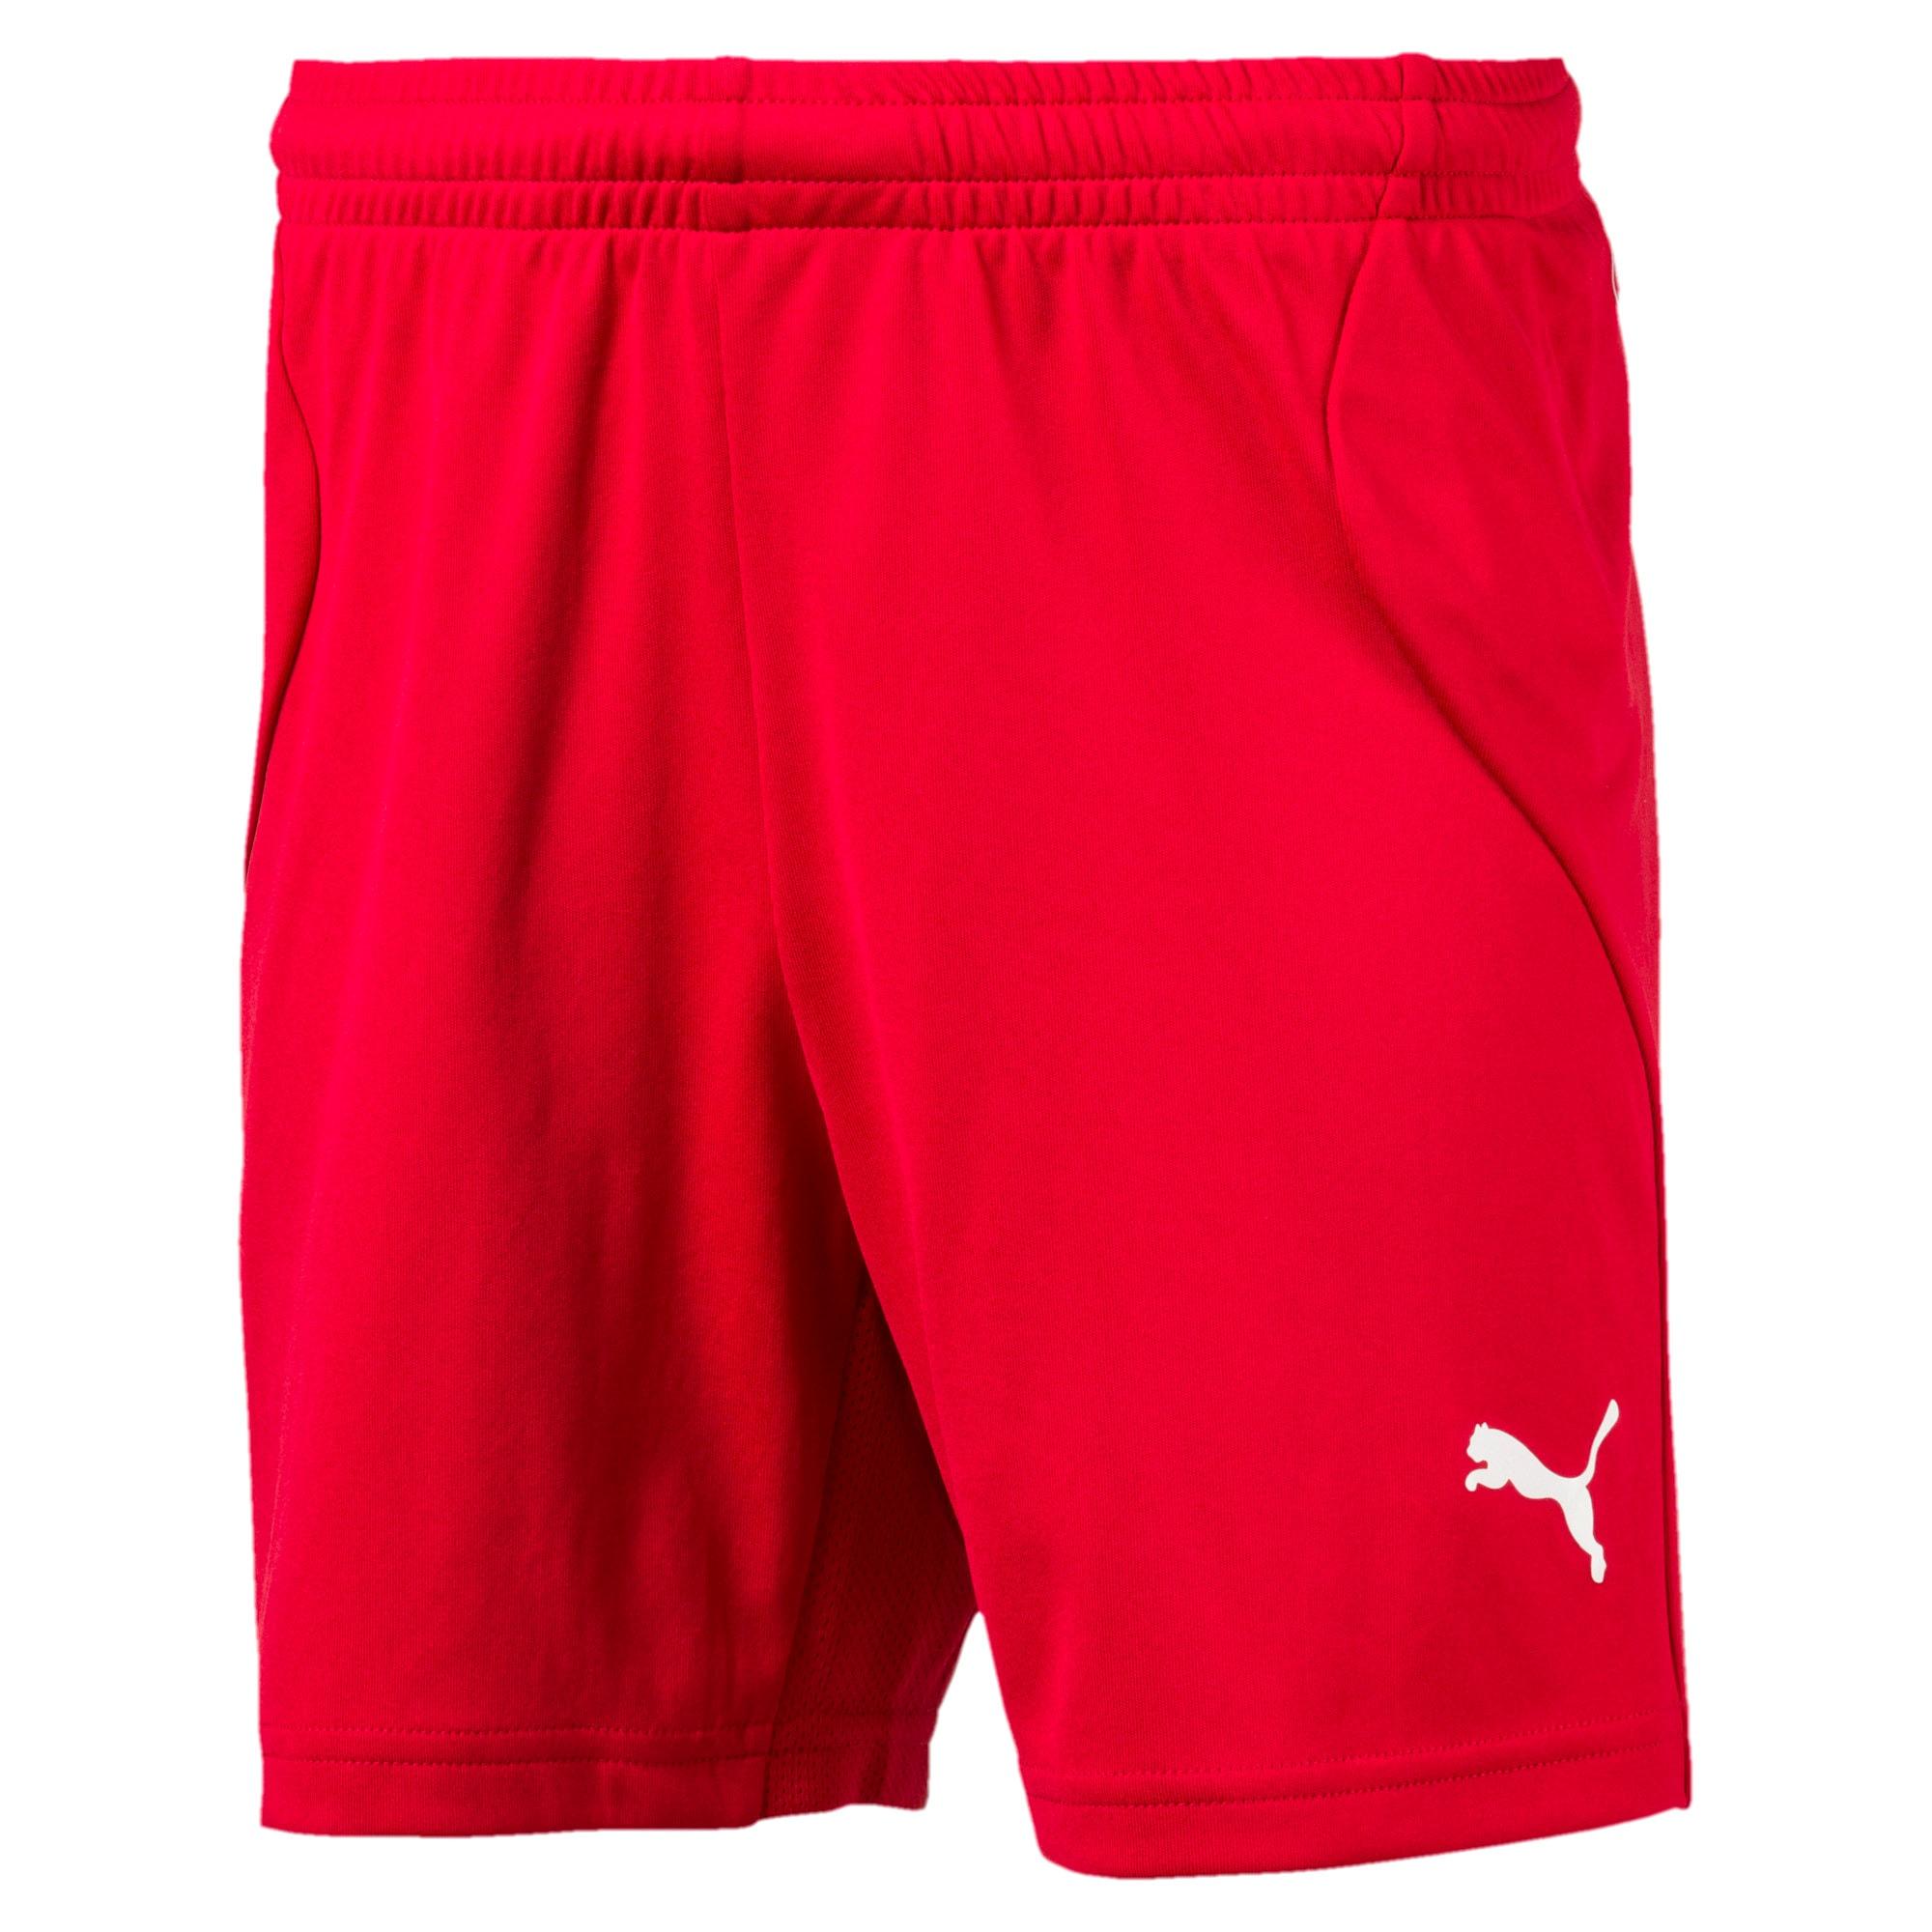 Thumbnail 1 of ftblTRG Kids' Football Training Shorts, Chili Pepper-Puma White, medium-IND